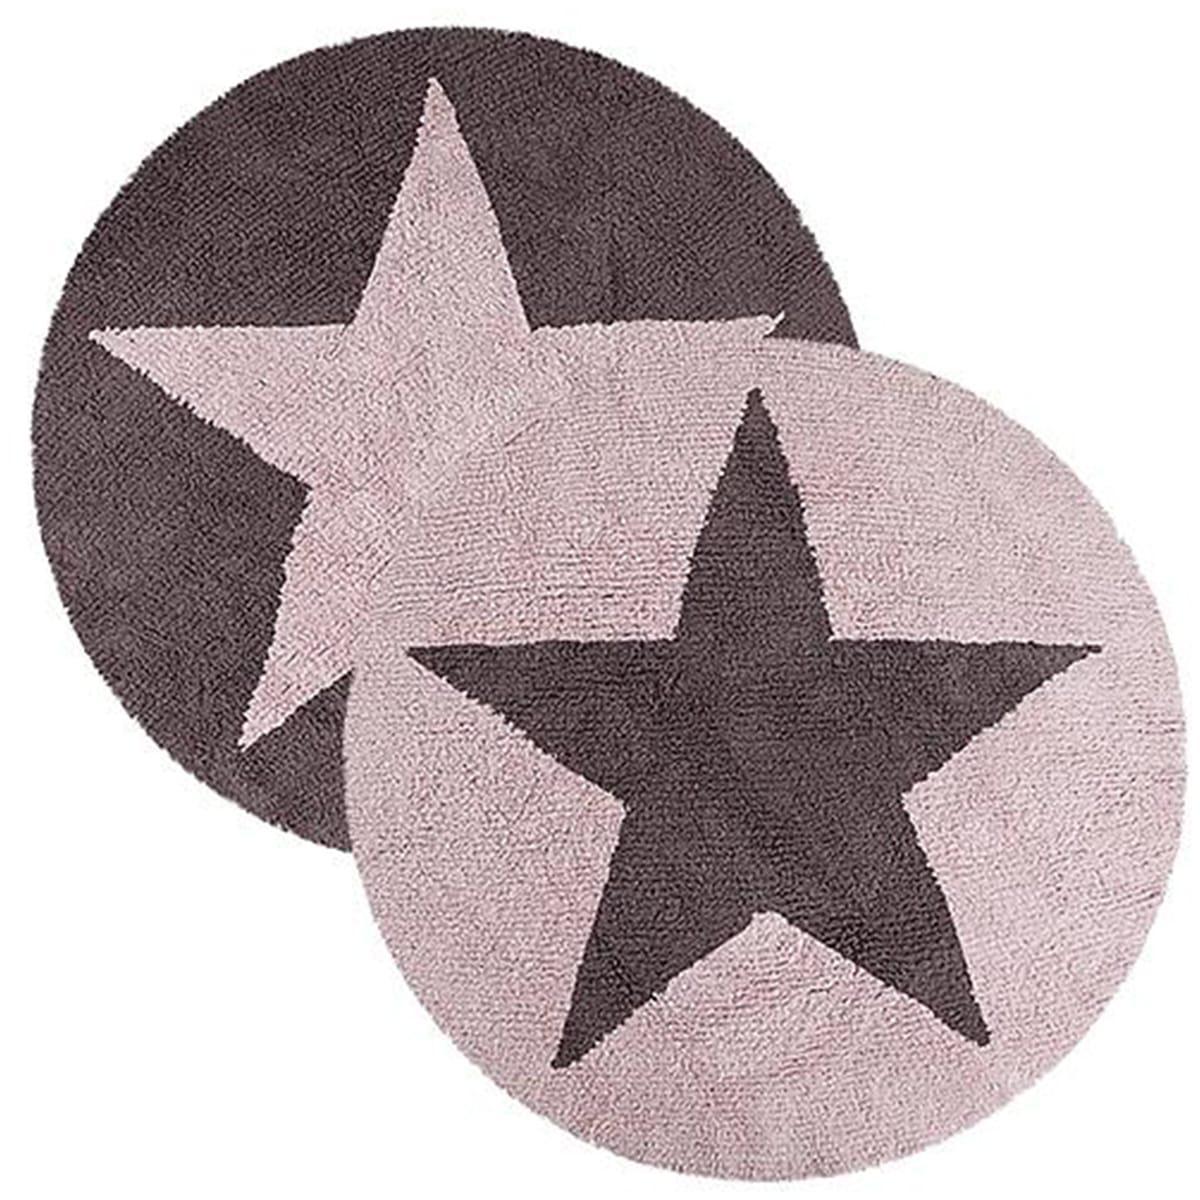 Alfombra redonda 140cm réversible STARS Lorena Canals pink-dark grey